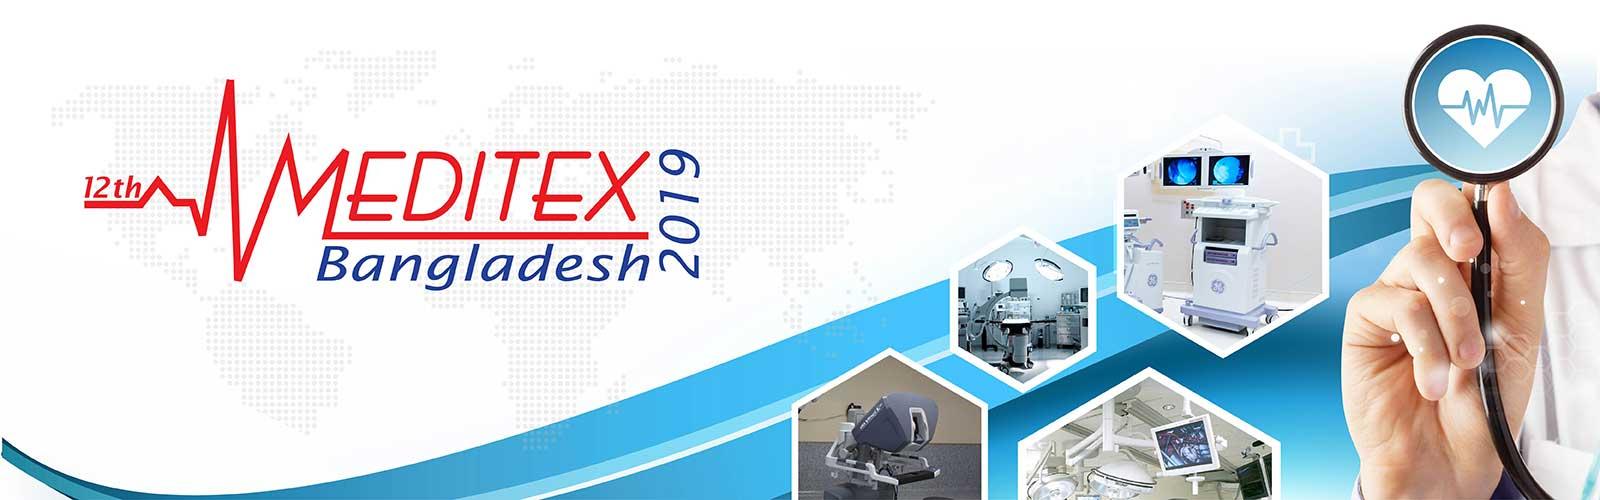 Meditex BD-2014 Number